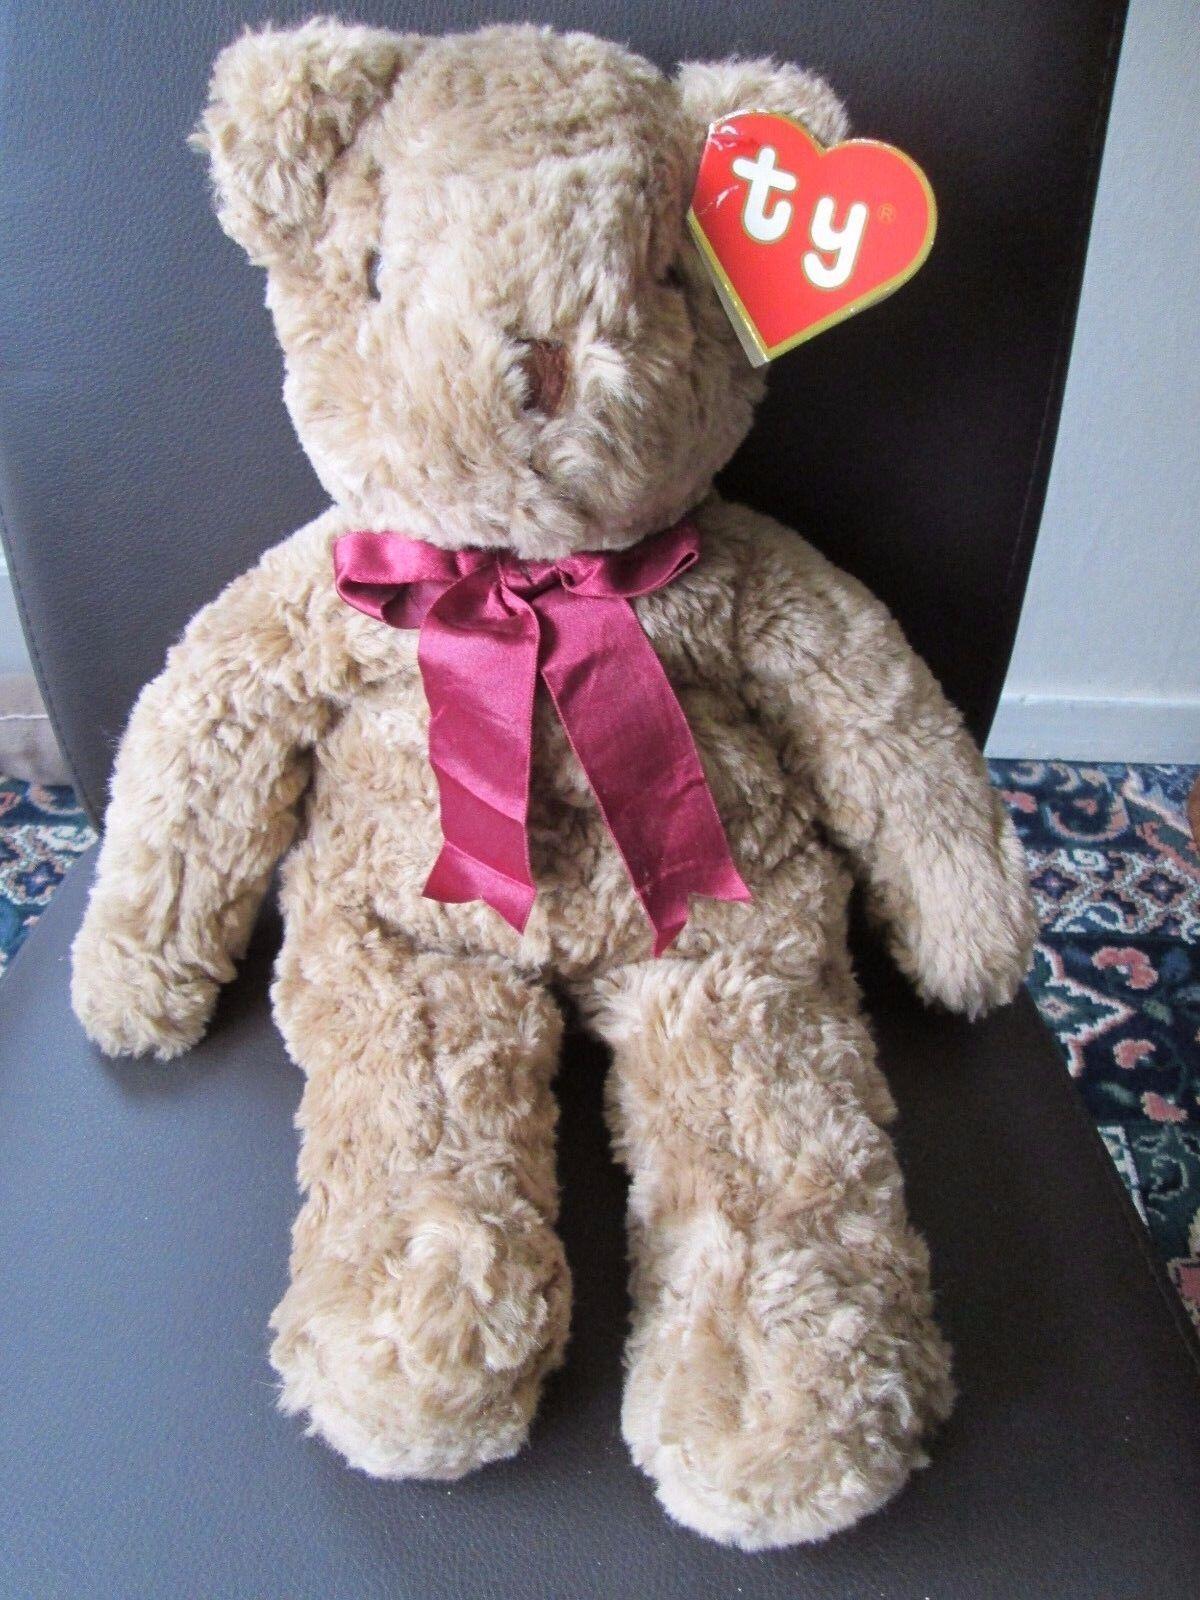 RUMPLES BEAR TY PLUSH, 17'', Burgundy Ribbon,1990 Hang Tag,Rare Collectable BEAR